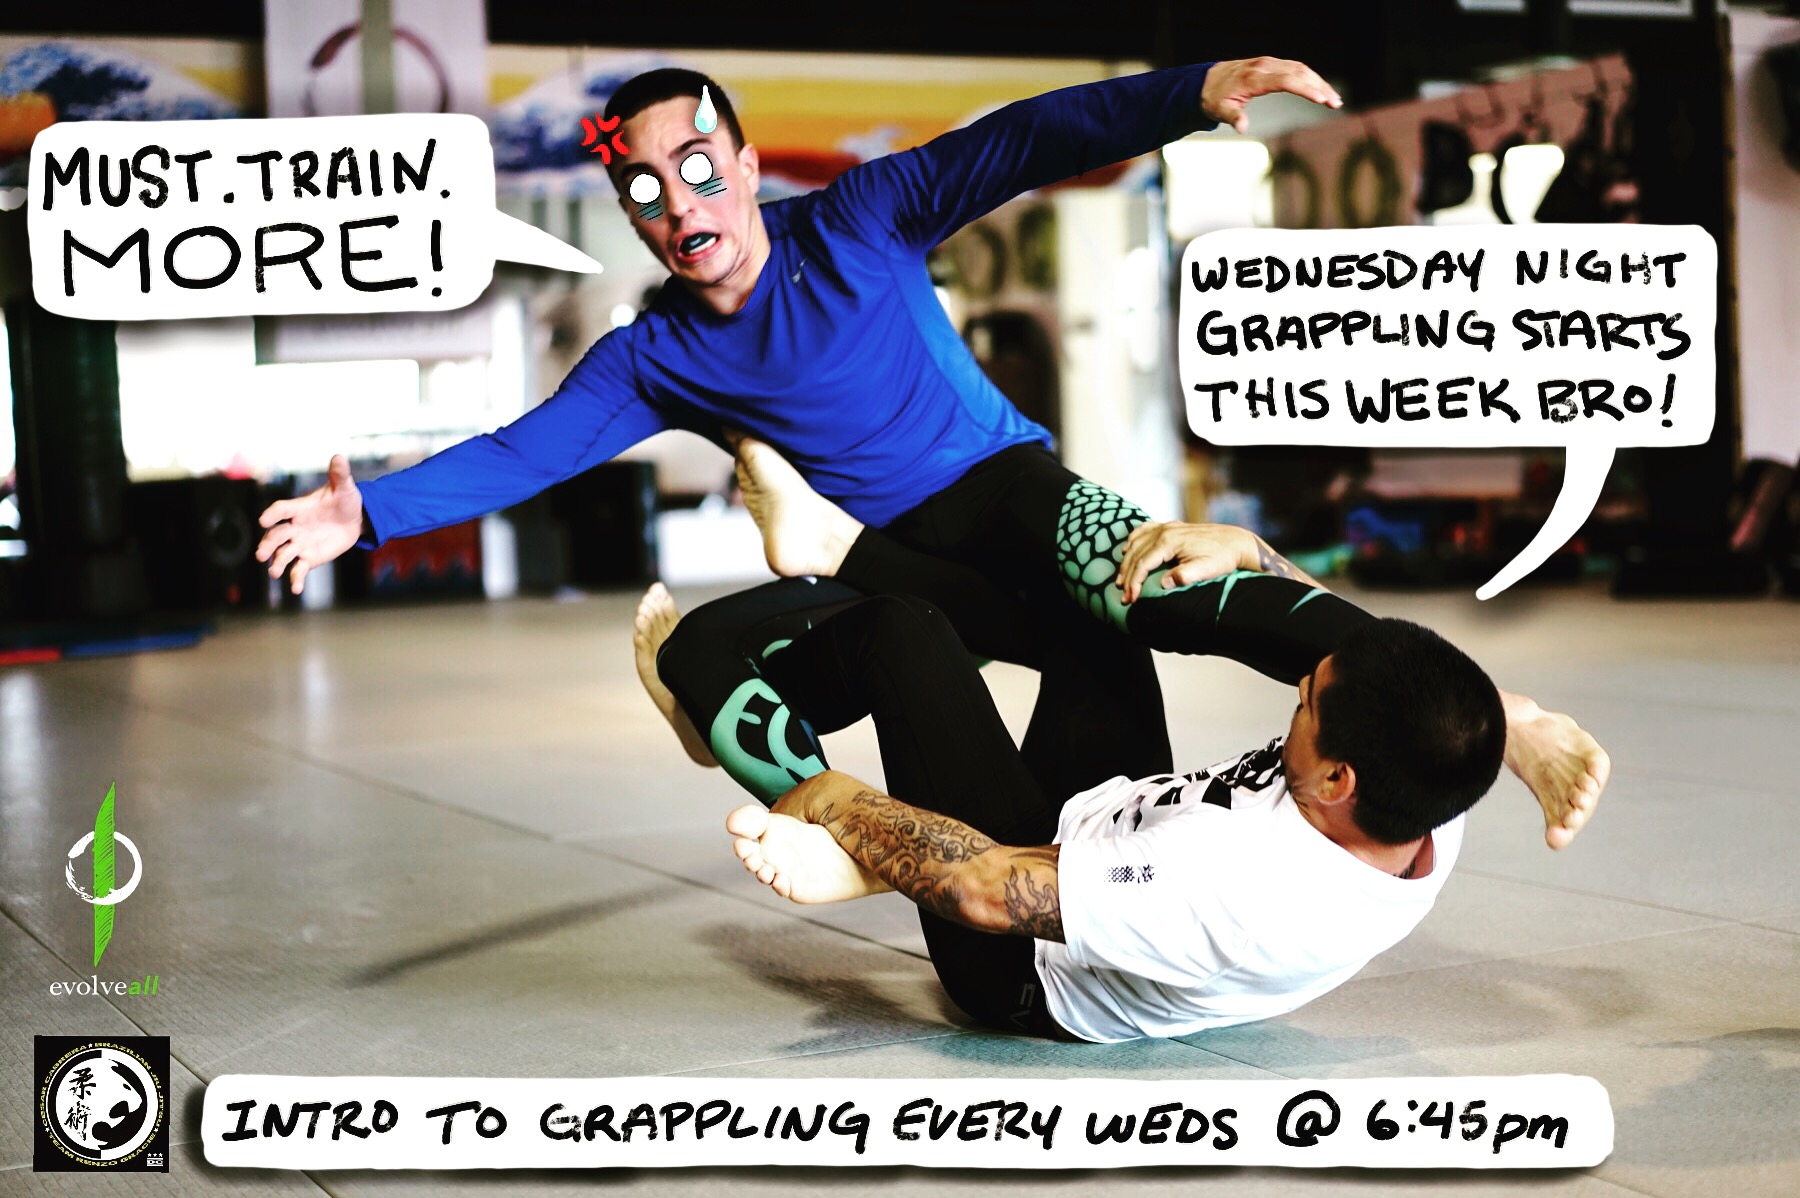 IMG 0160 - Wednesday Evening Grappling and Brazilian Jiu-Jitsu